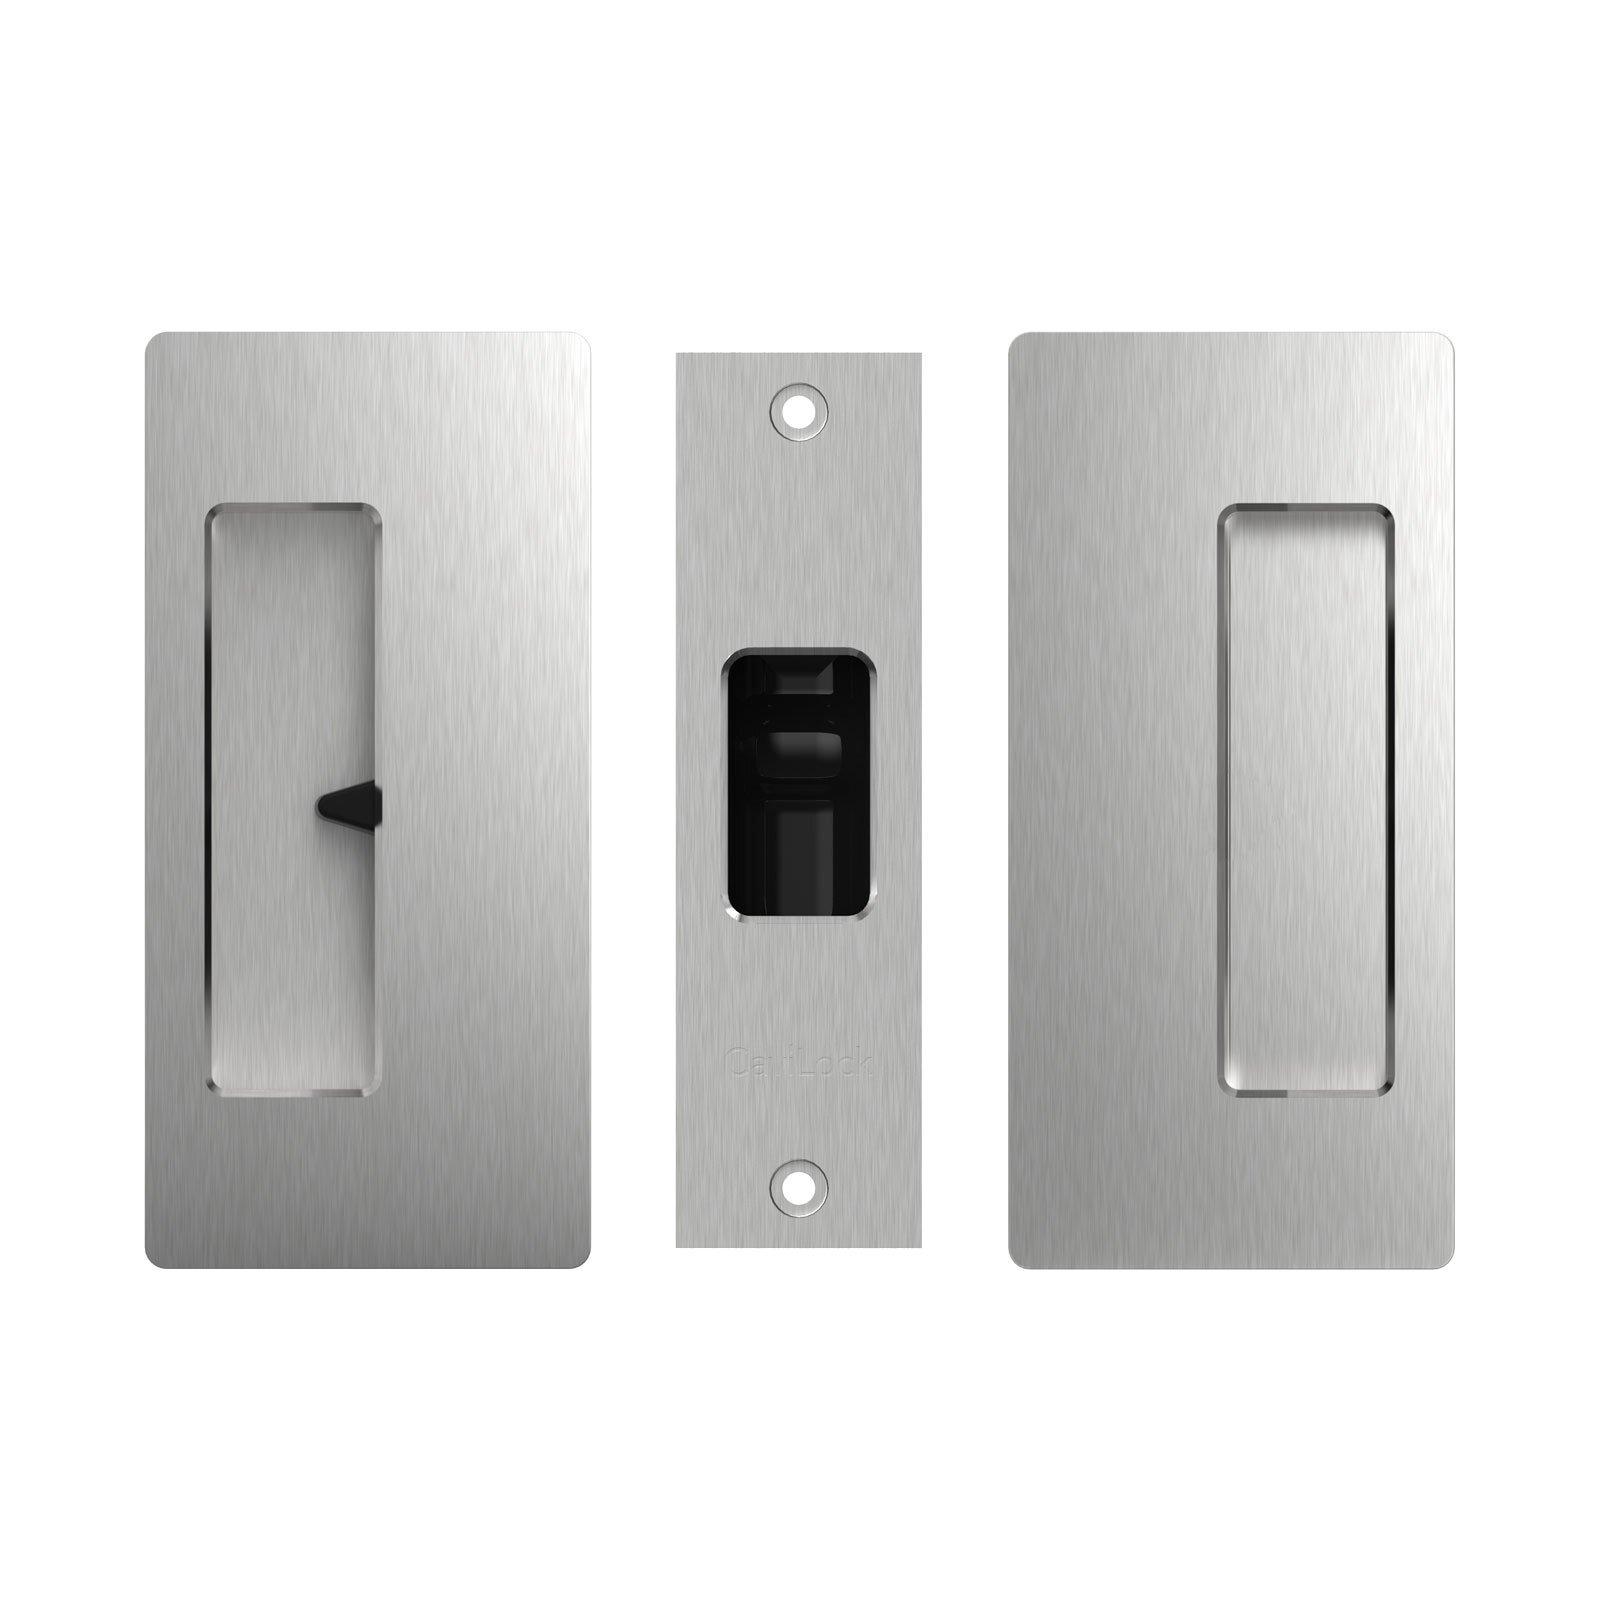 CaviLock Satin Chrome CL200 Privacy Cavity Slider Handle